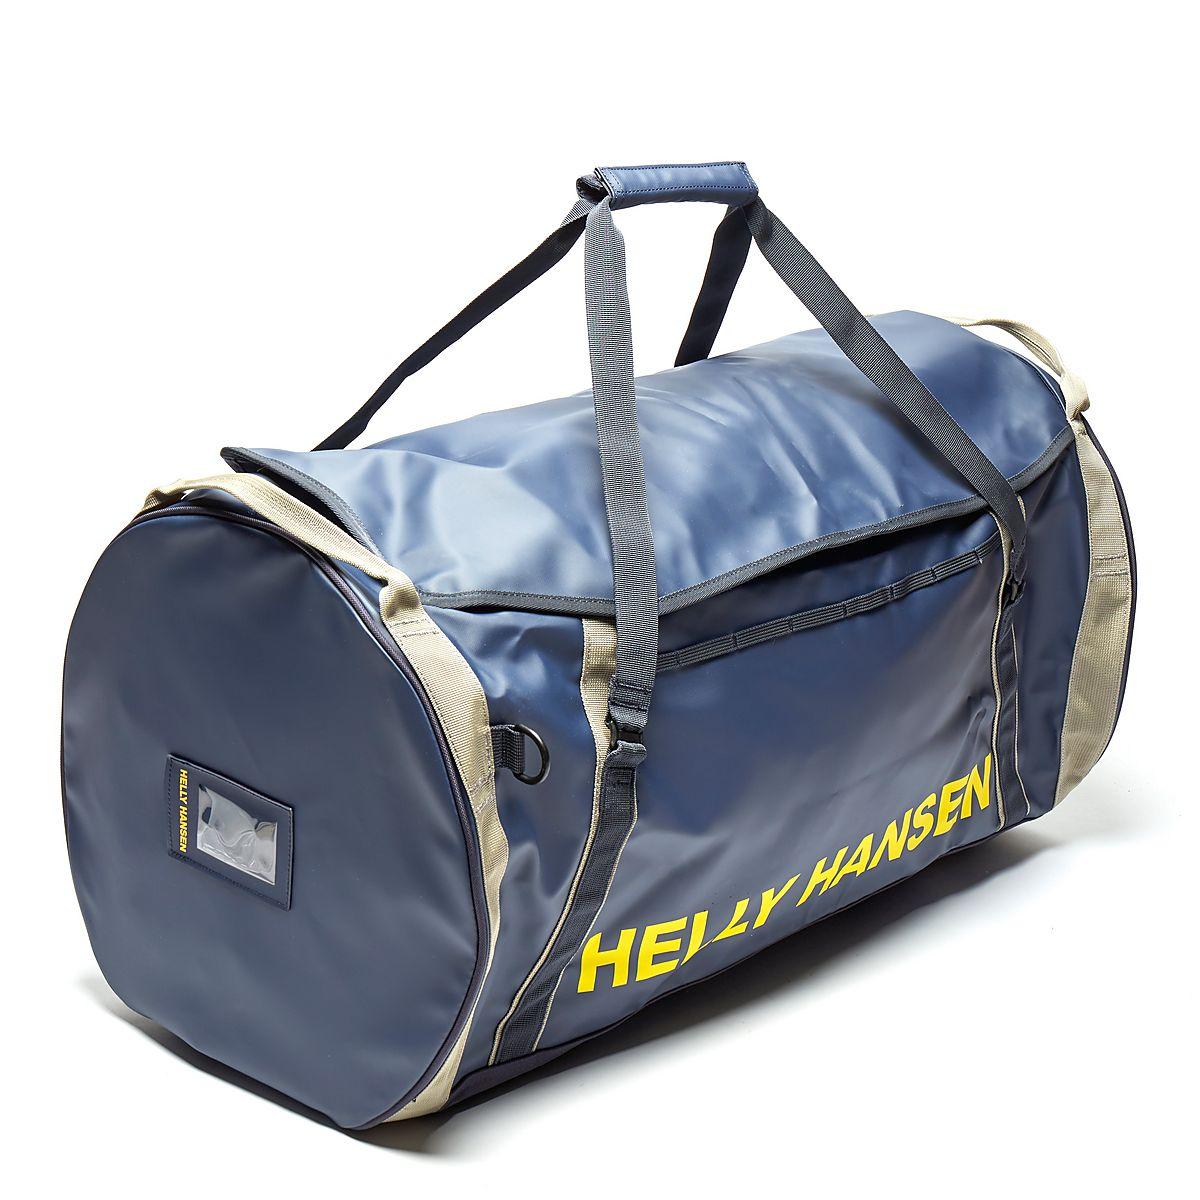 Helly Hansen 90L Duffel Bag 2 at Activ Instinct for £38.25